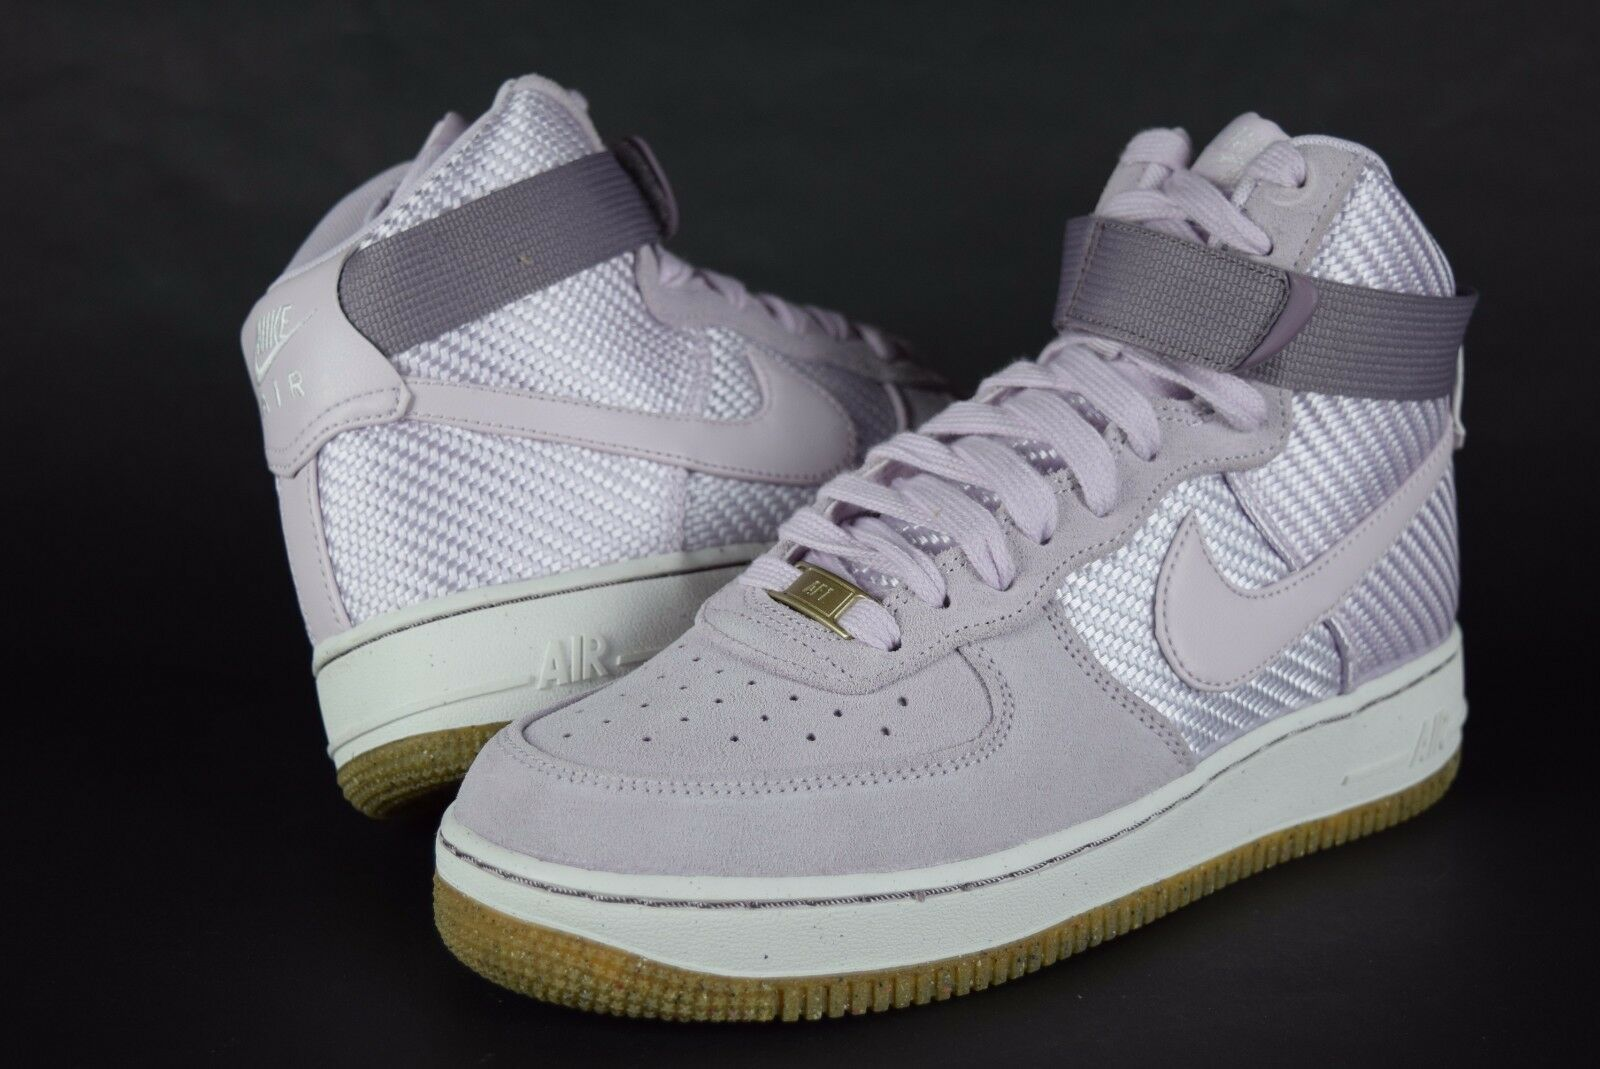 New Damenschuhe Nike Air Force 1 HI PRM 654440 500 Lilac sz 8.5-10 sneakers